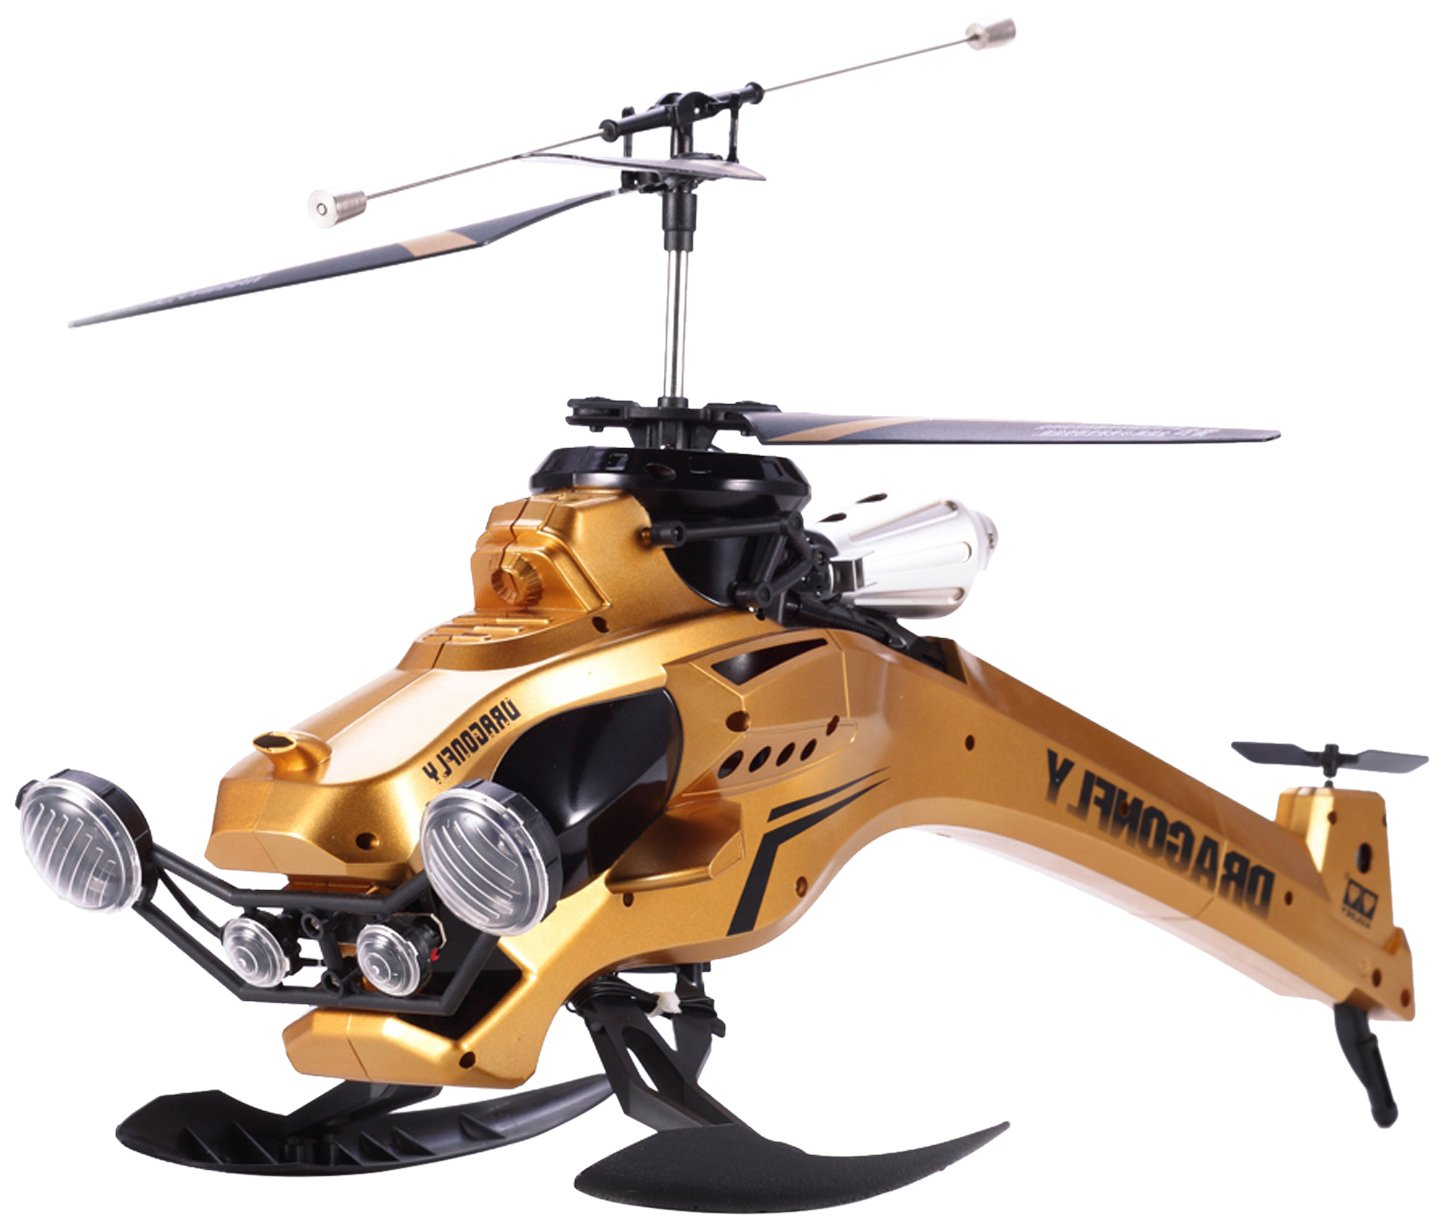 42cm三通轰天暴龙直升机(金色)85